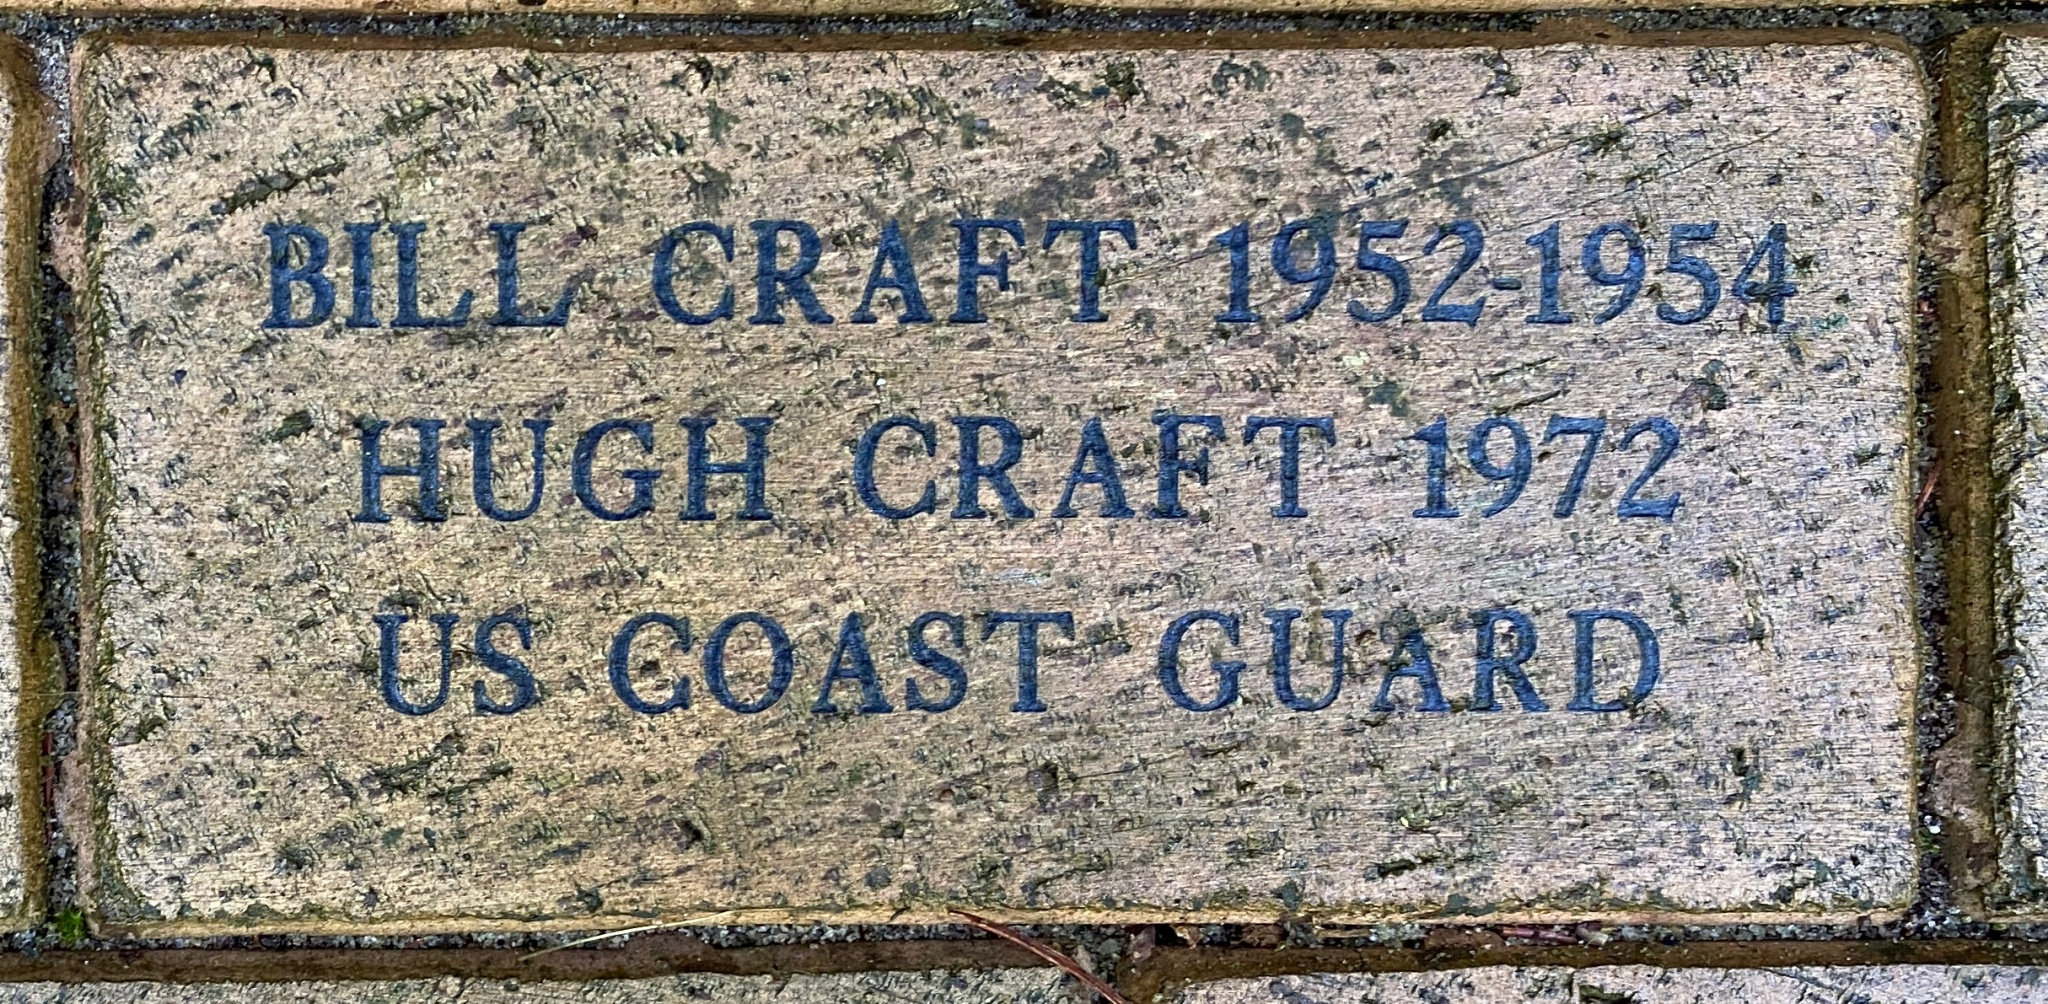 BILL CRAFT 1952-1954 HUGH CRAFT 1972 US COAST GUARD